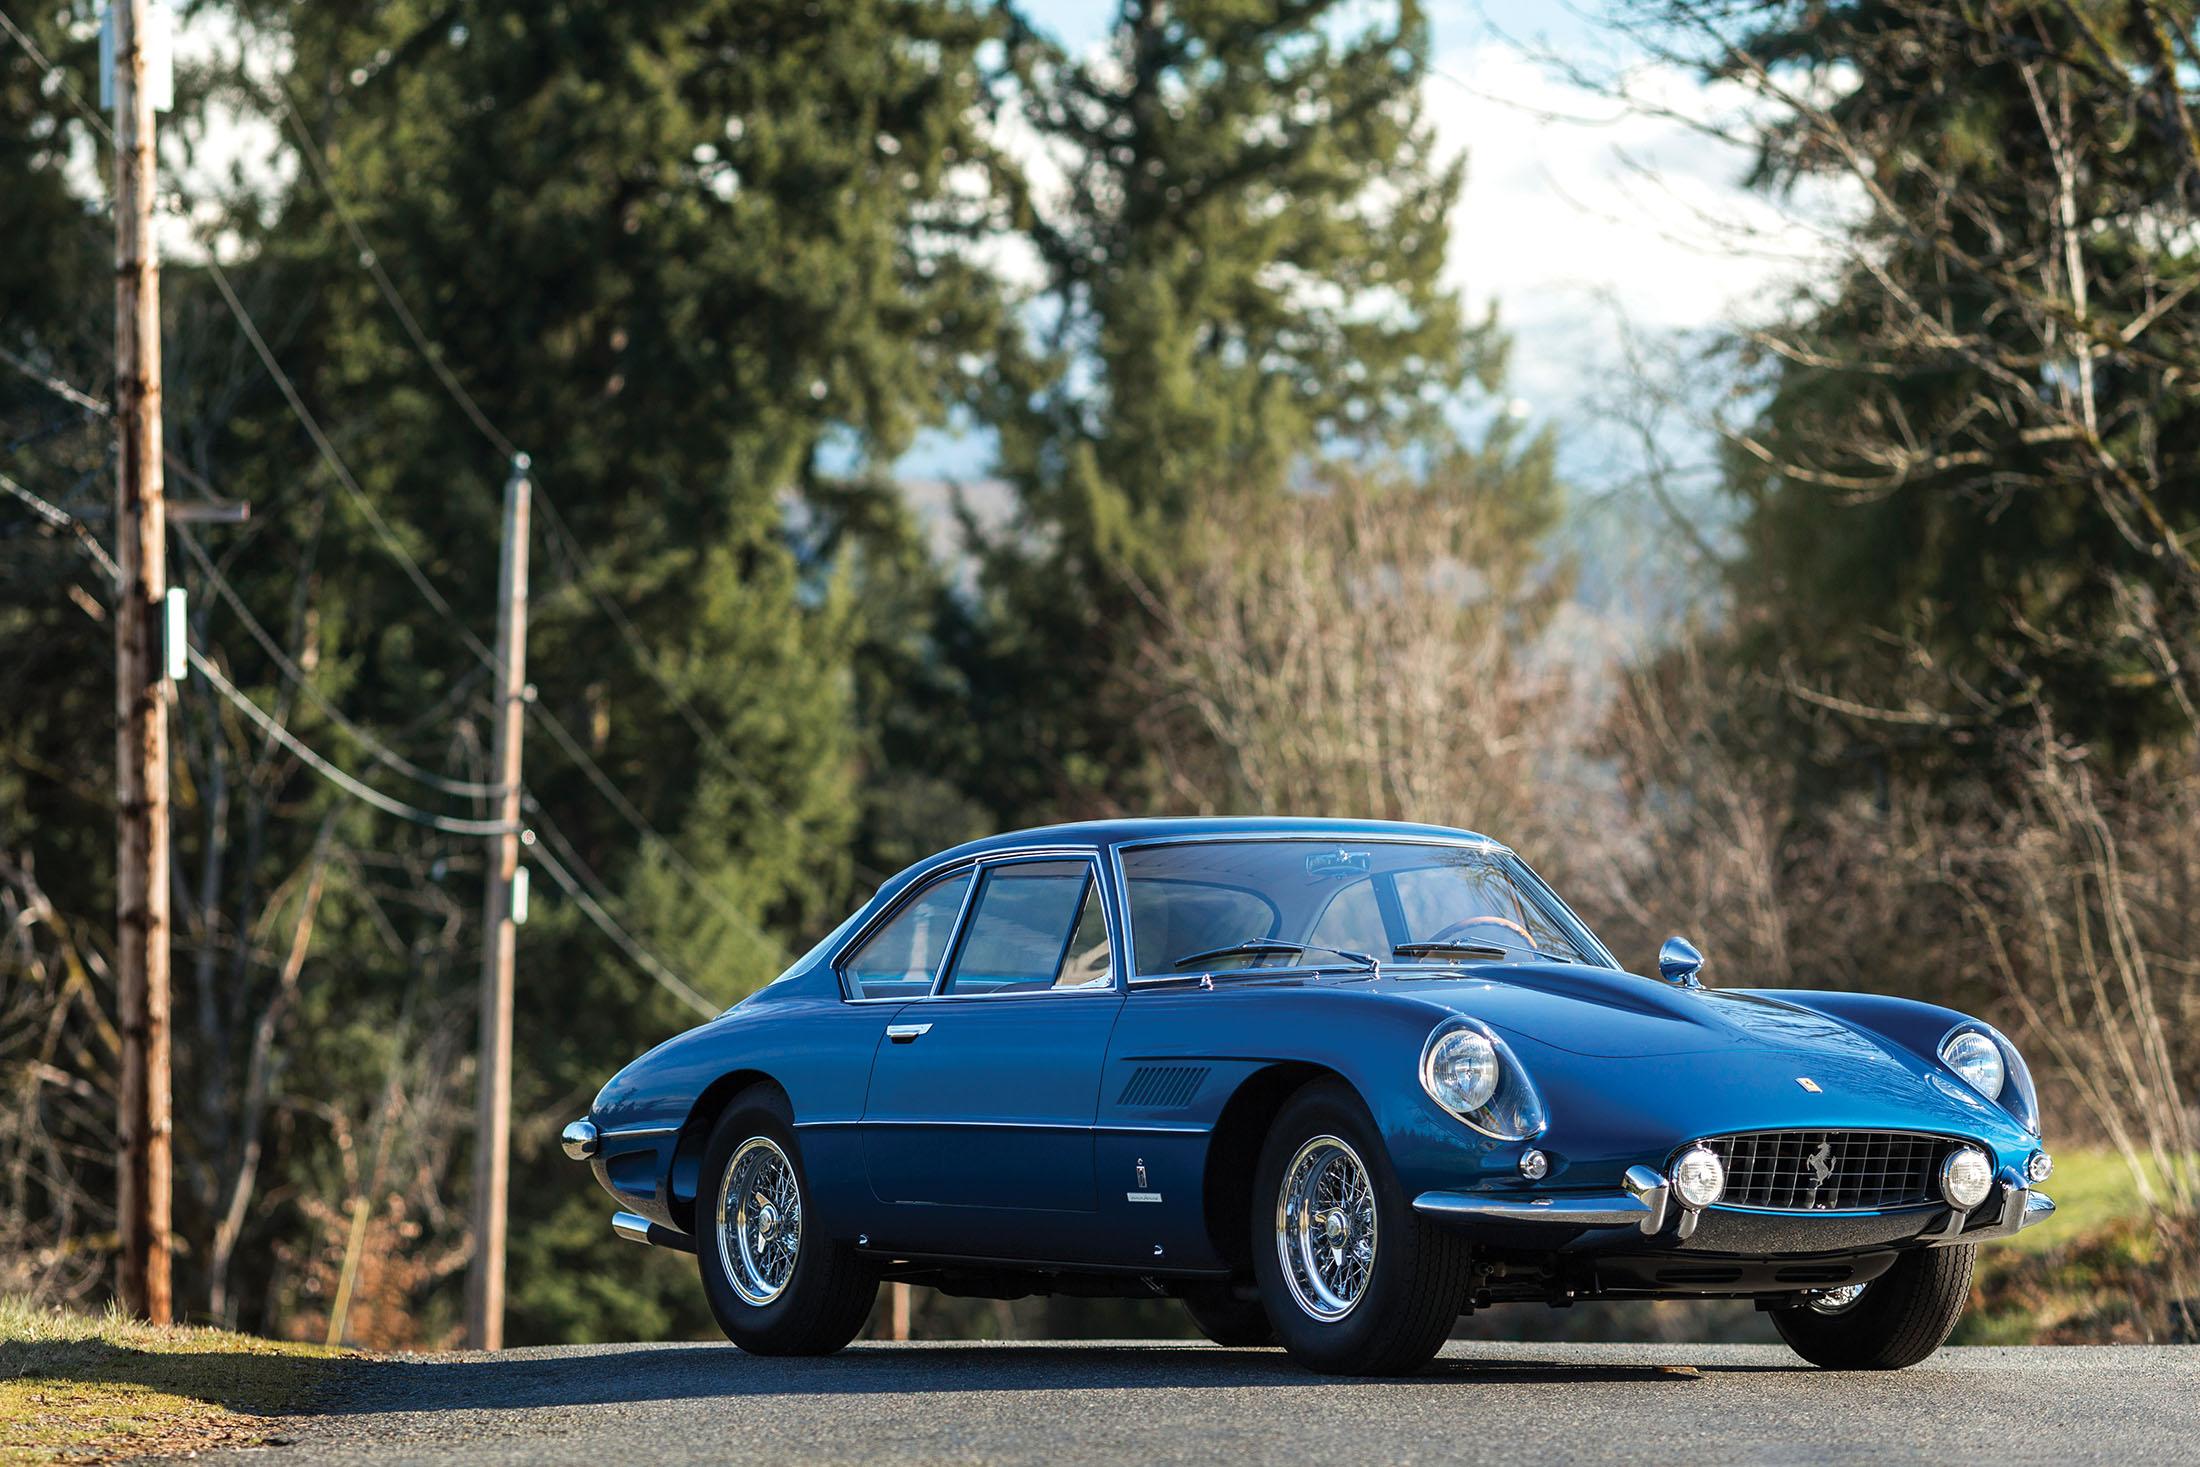 $4,400,000— 1962 Ferrari 400 Superamerica Coupe